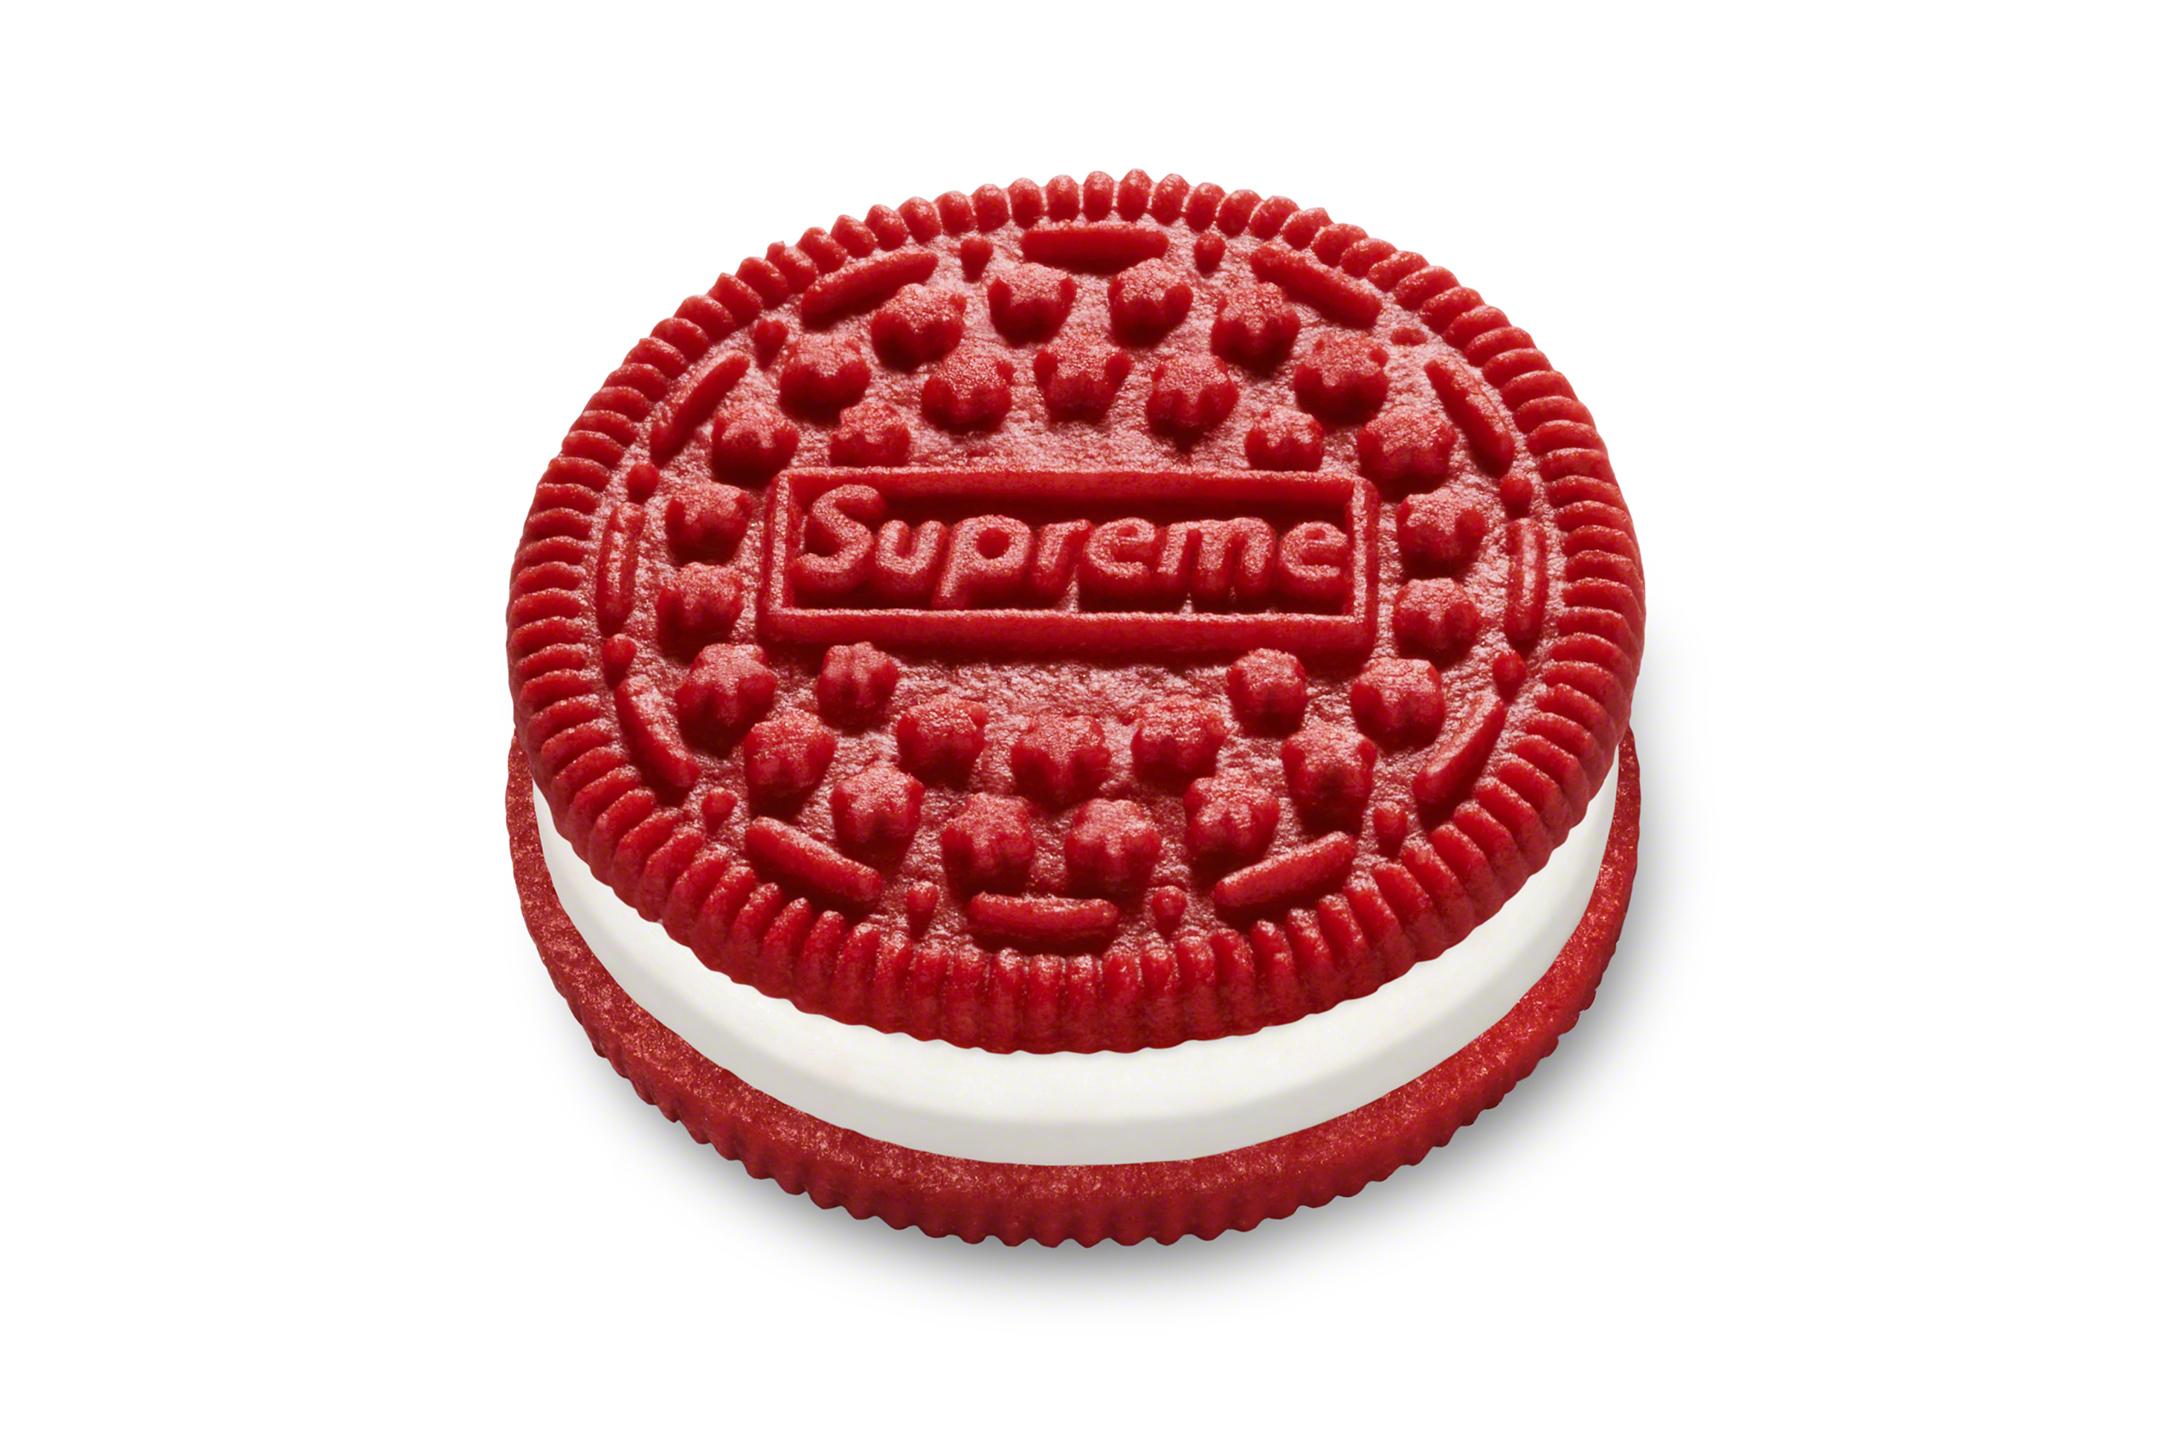 Supreme 2020 SS Lifestyle accessories